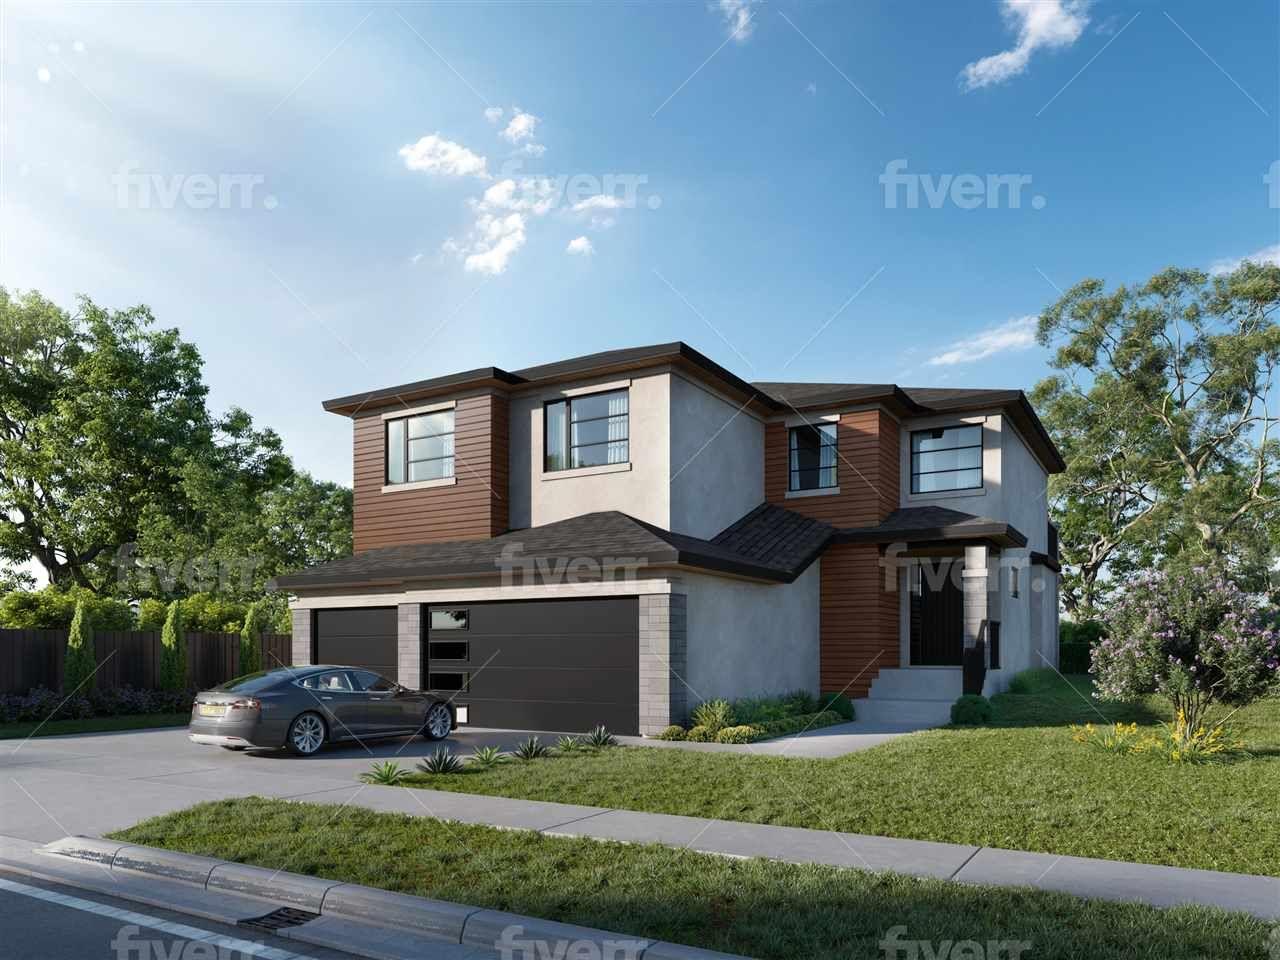 Main Photo: 4121 KENNEDY Green in Edmonton: Zone 56 House for sale : MLS®# E4236029